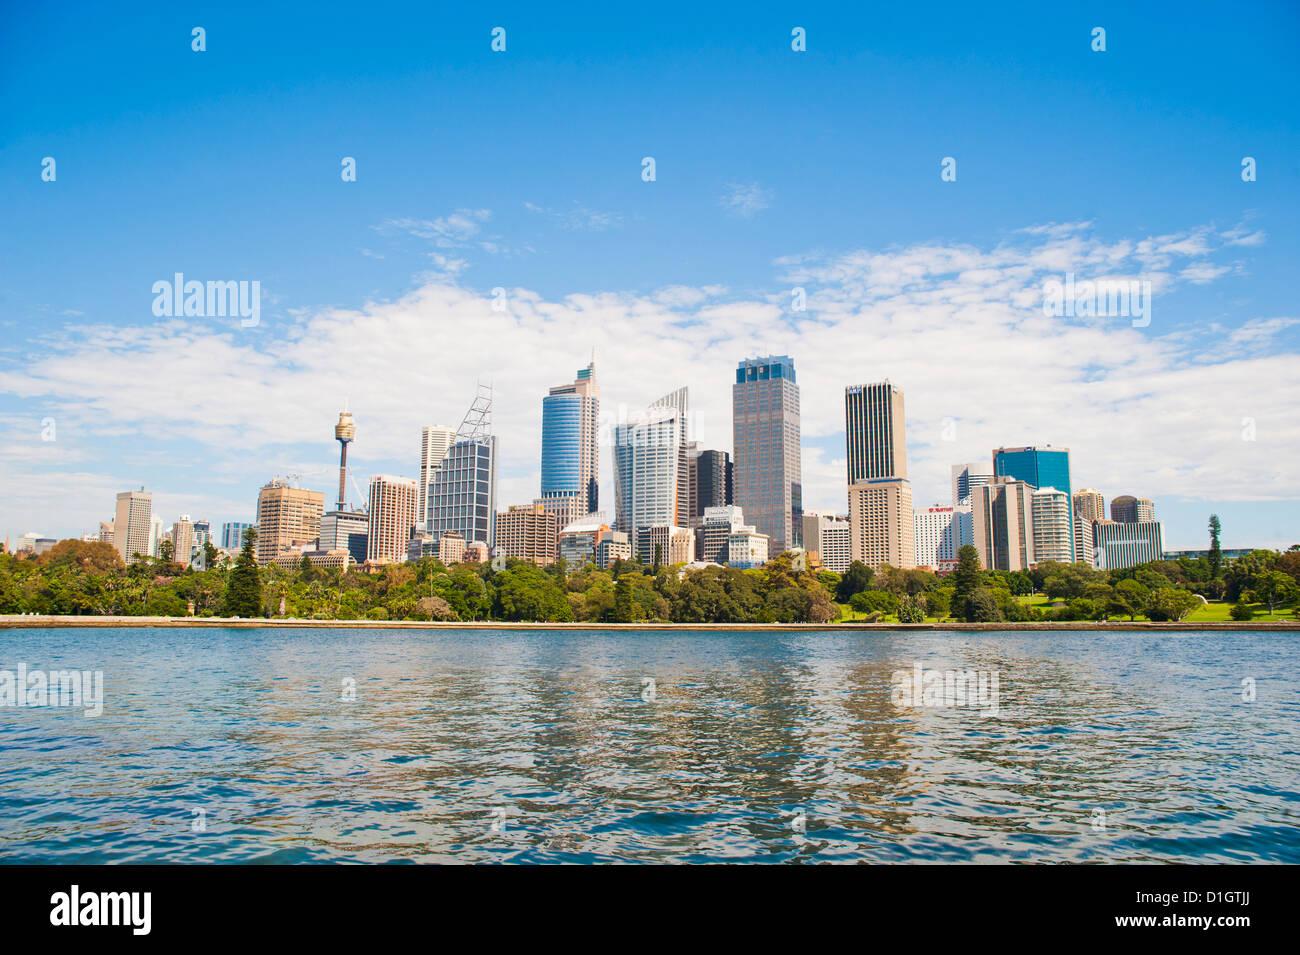 Sydney city centre and central business district (CBD) from Sydney Botanic Gardens, Sydney, New South Wales, Australia, - Stock Image